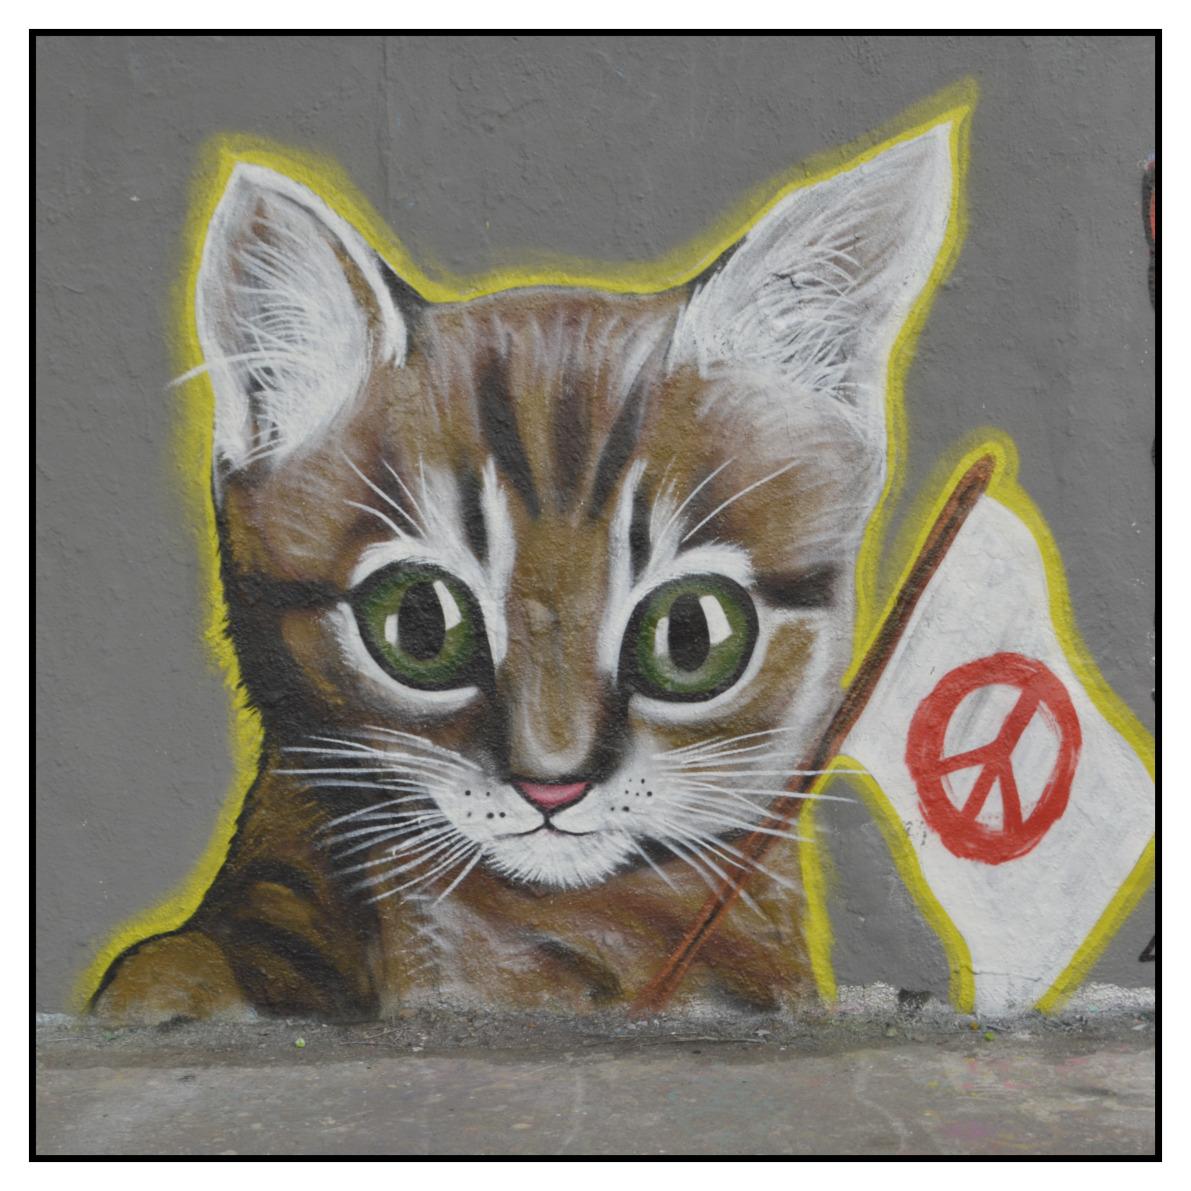 Mauerpark berlin grafitti eme freethinker